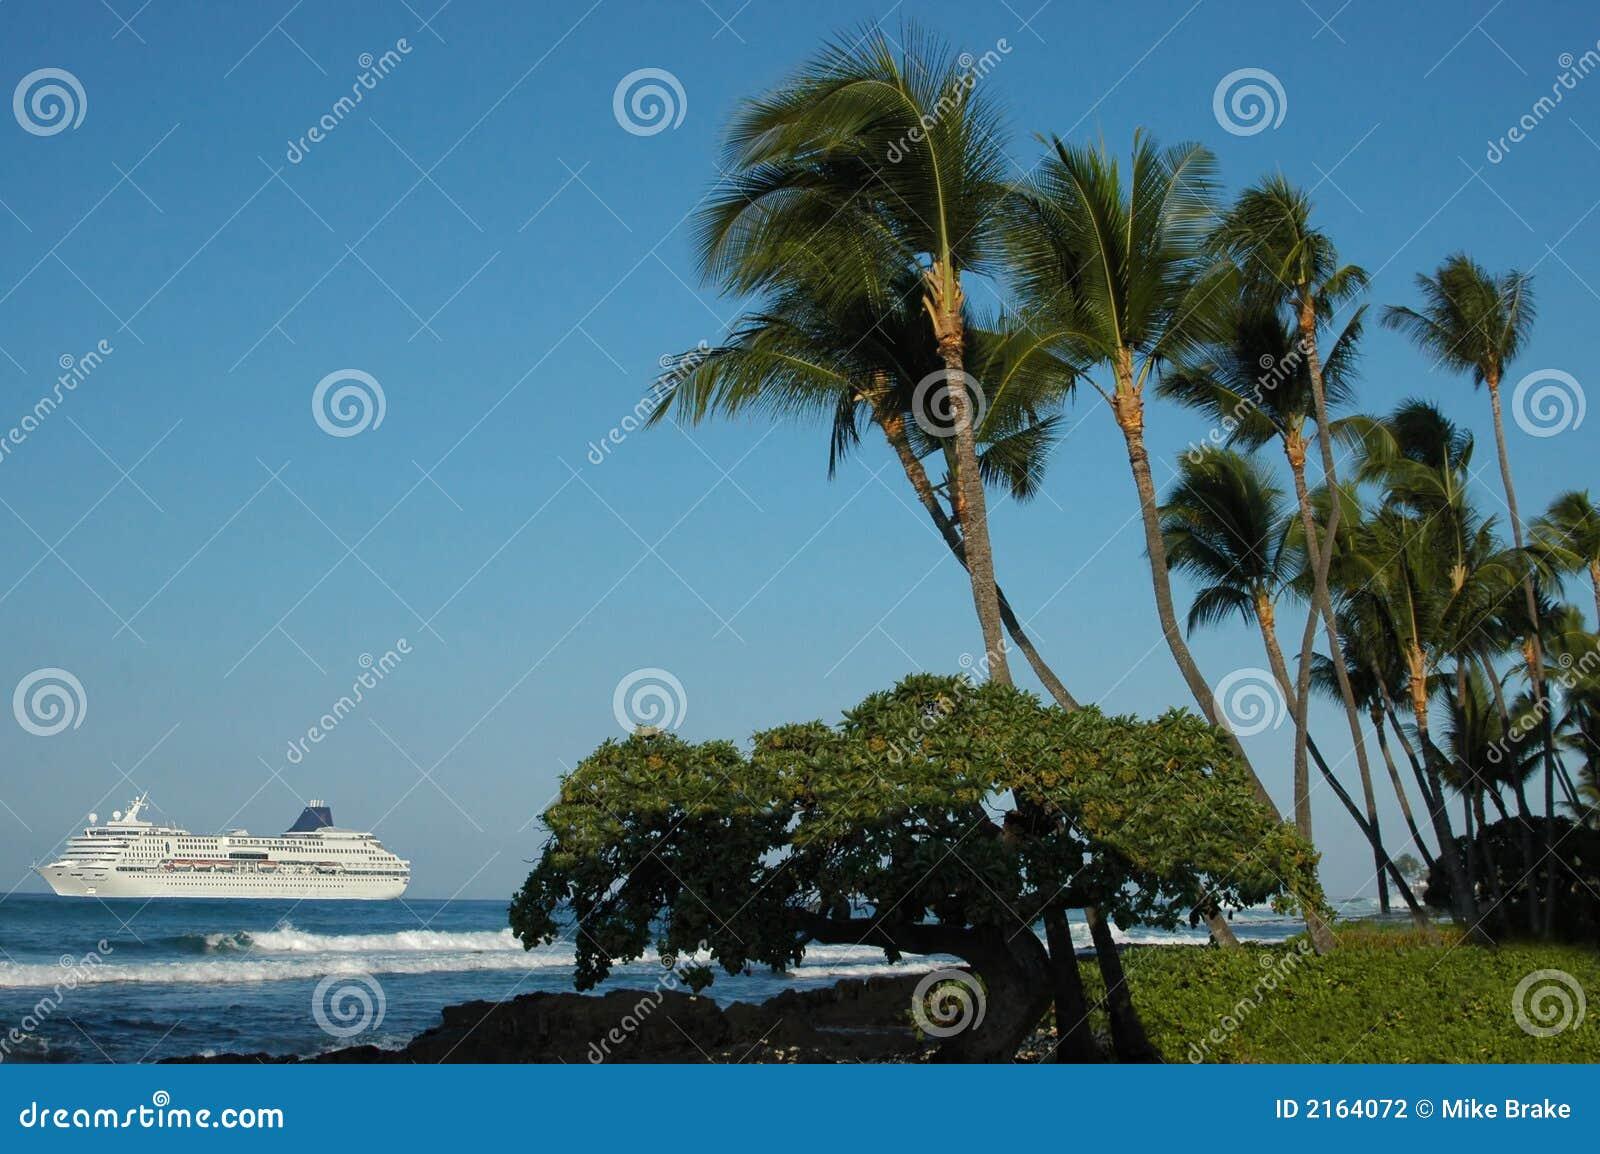 Tropical Hawaiian Cruise Ship